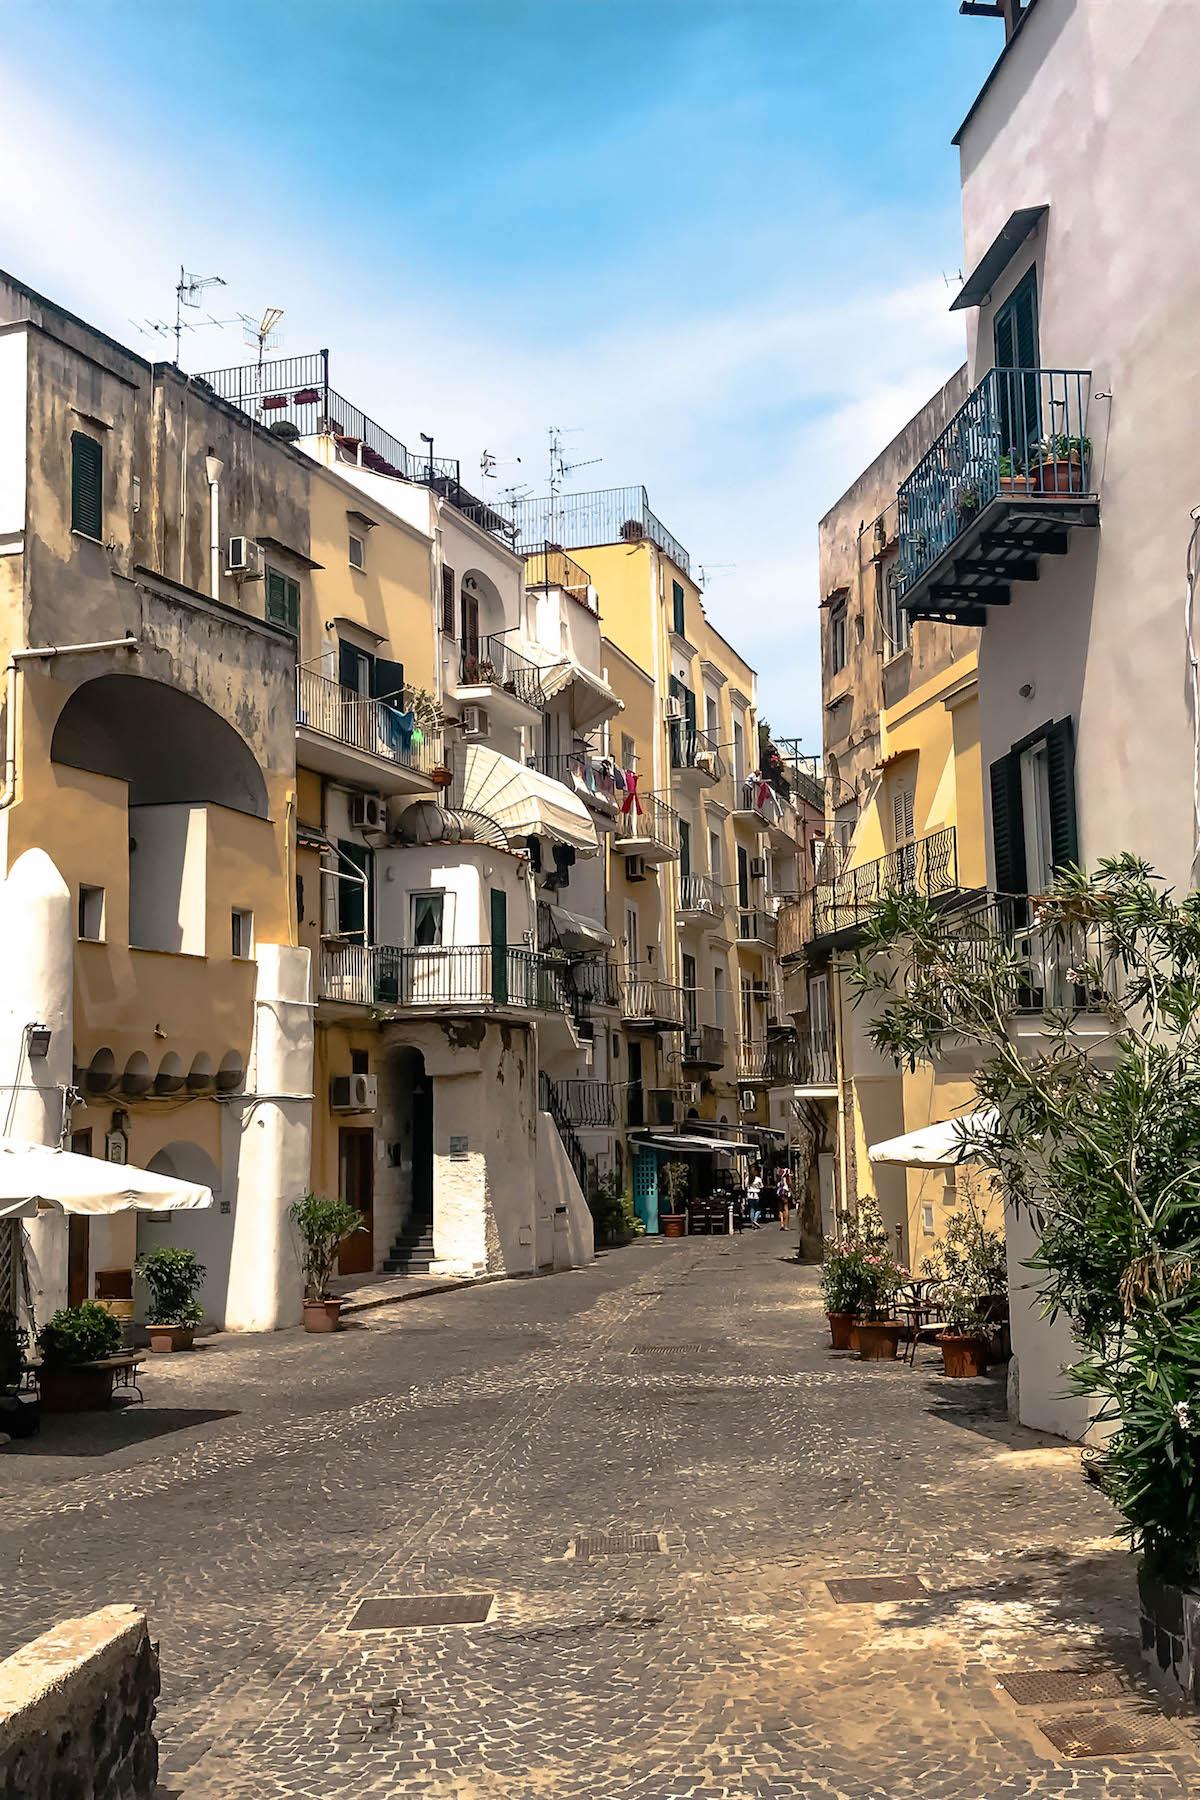 Ischia Travel Guide & Itinerary